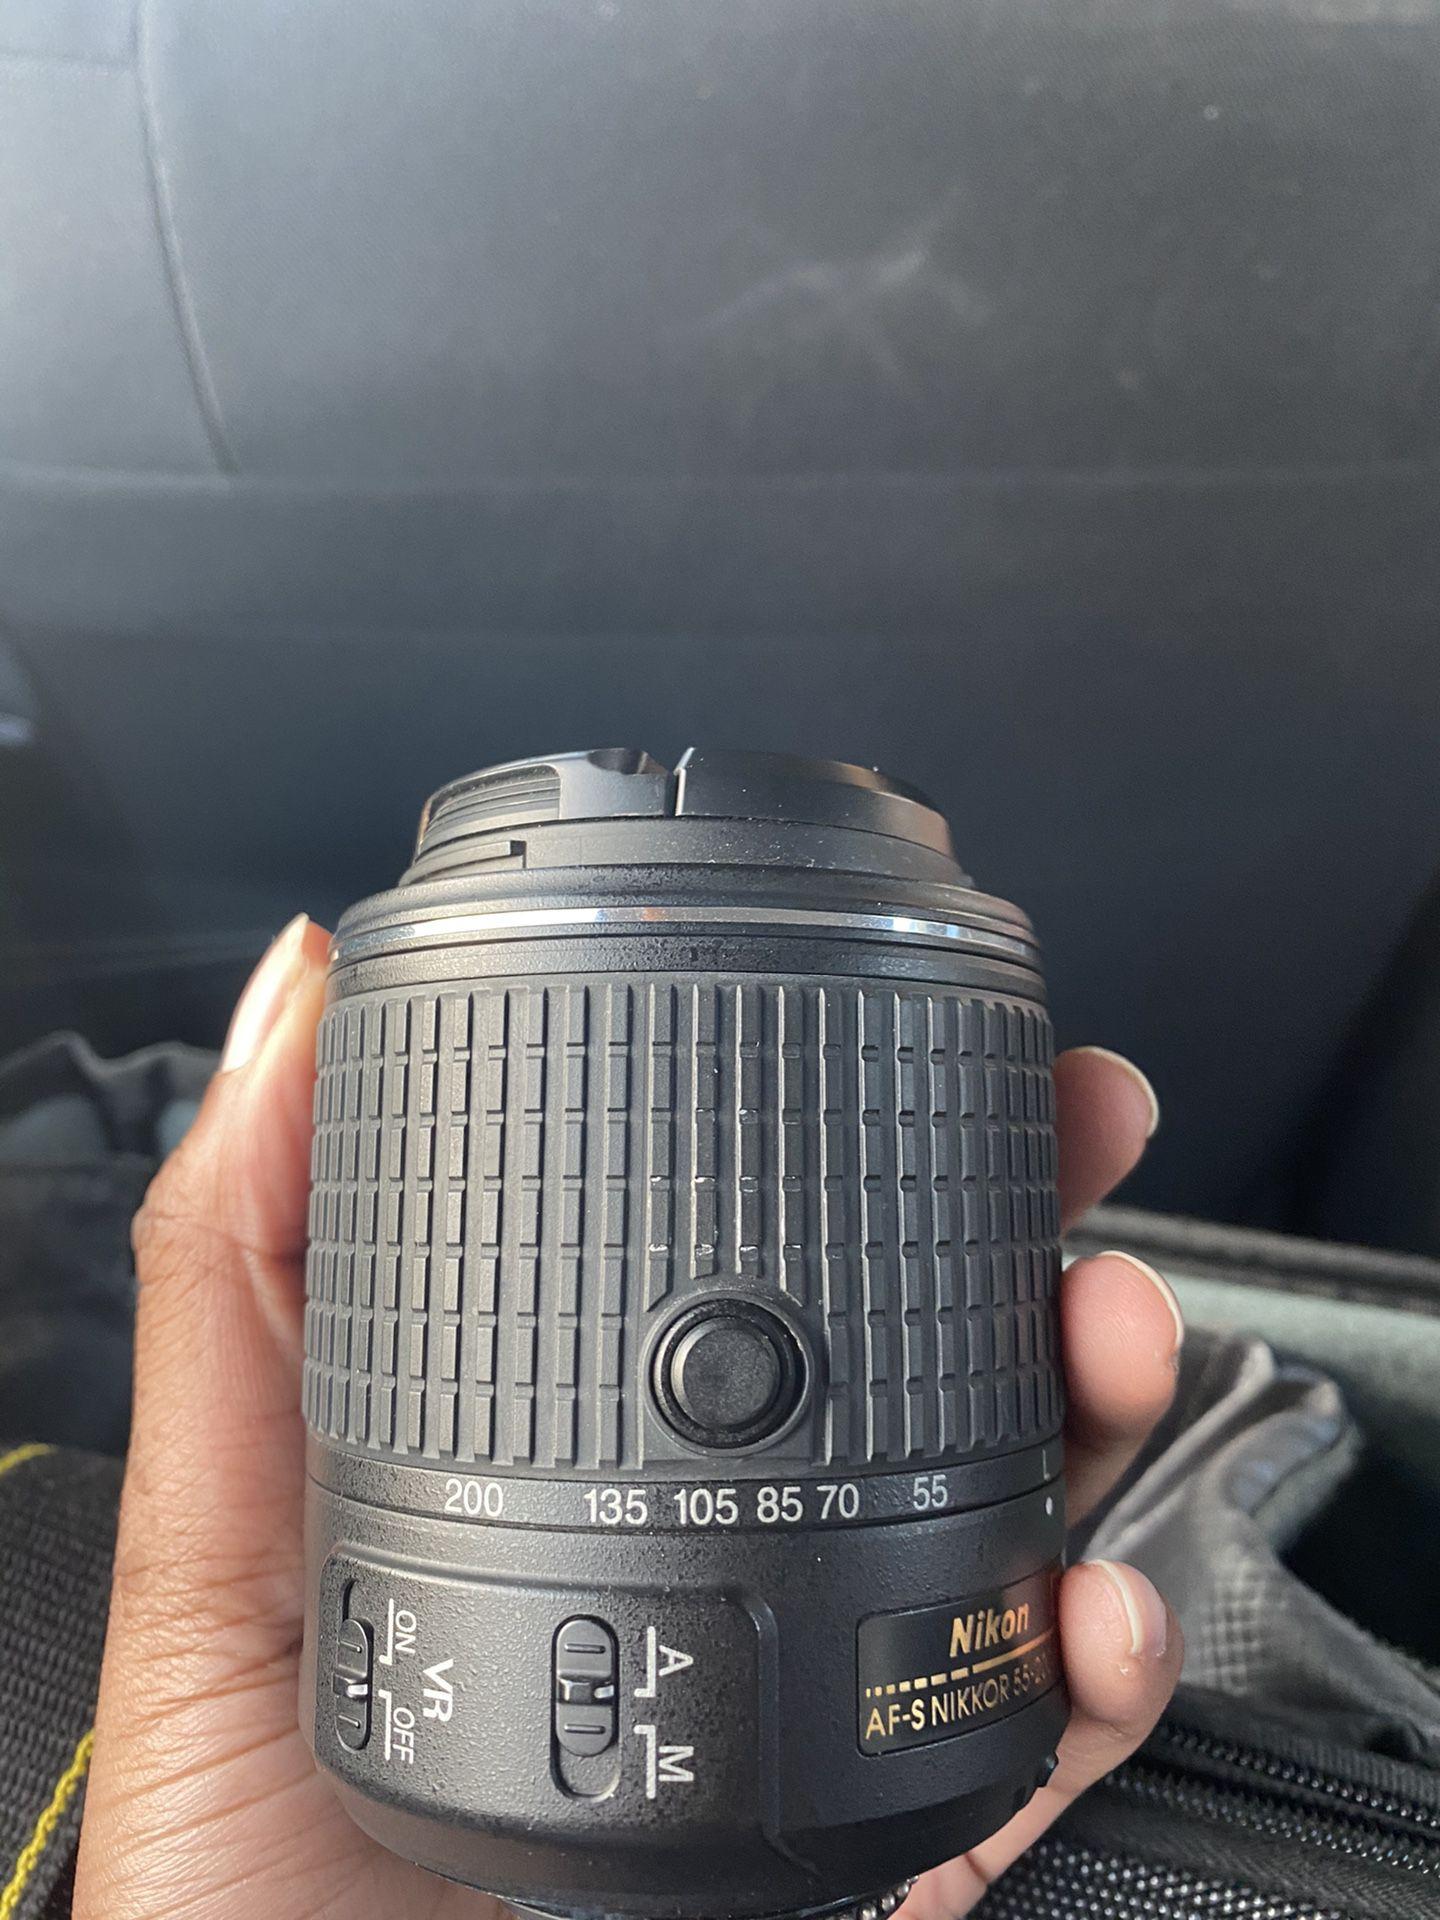 Nikon D3300 comes with 2 lenses